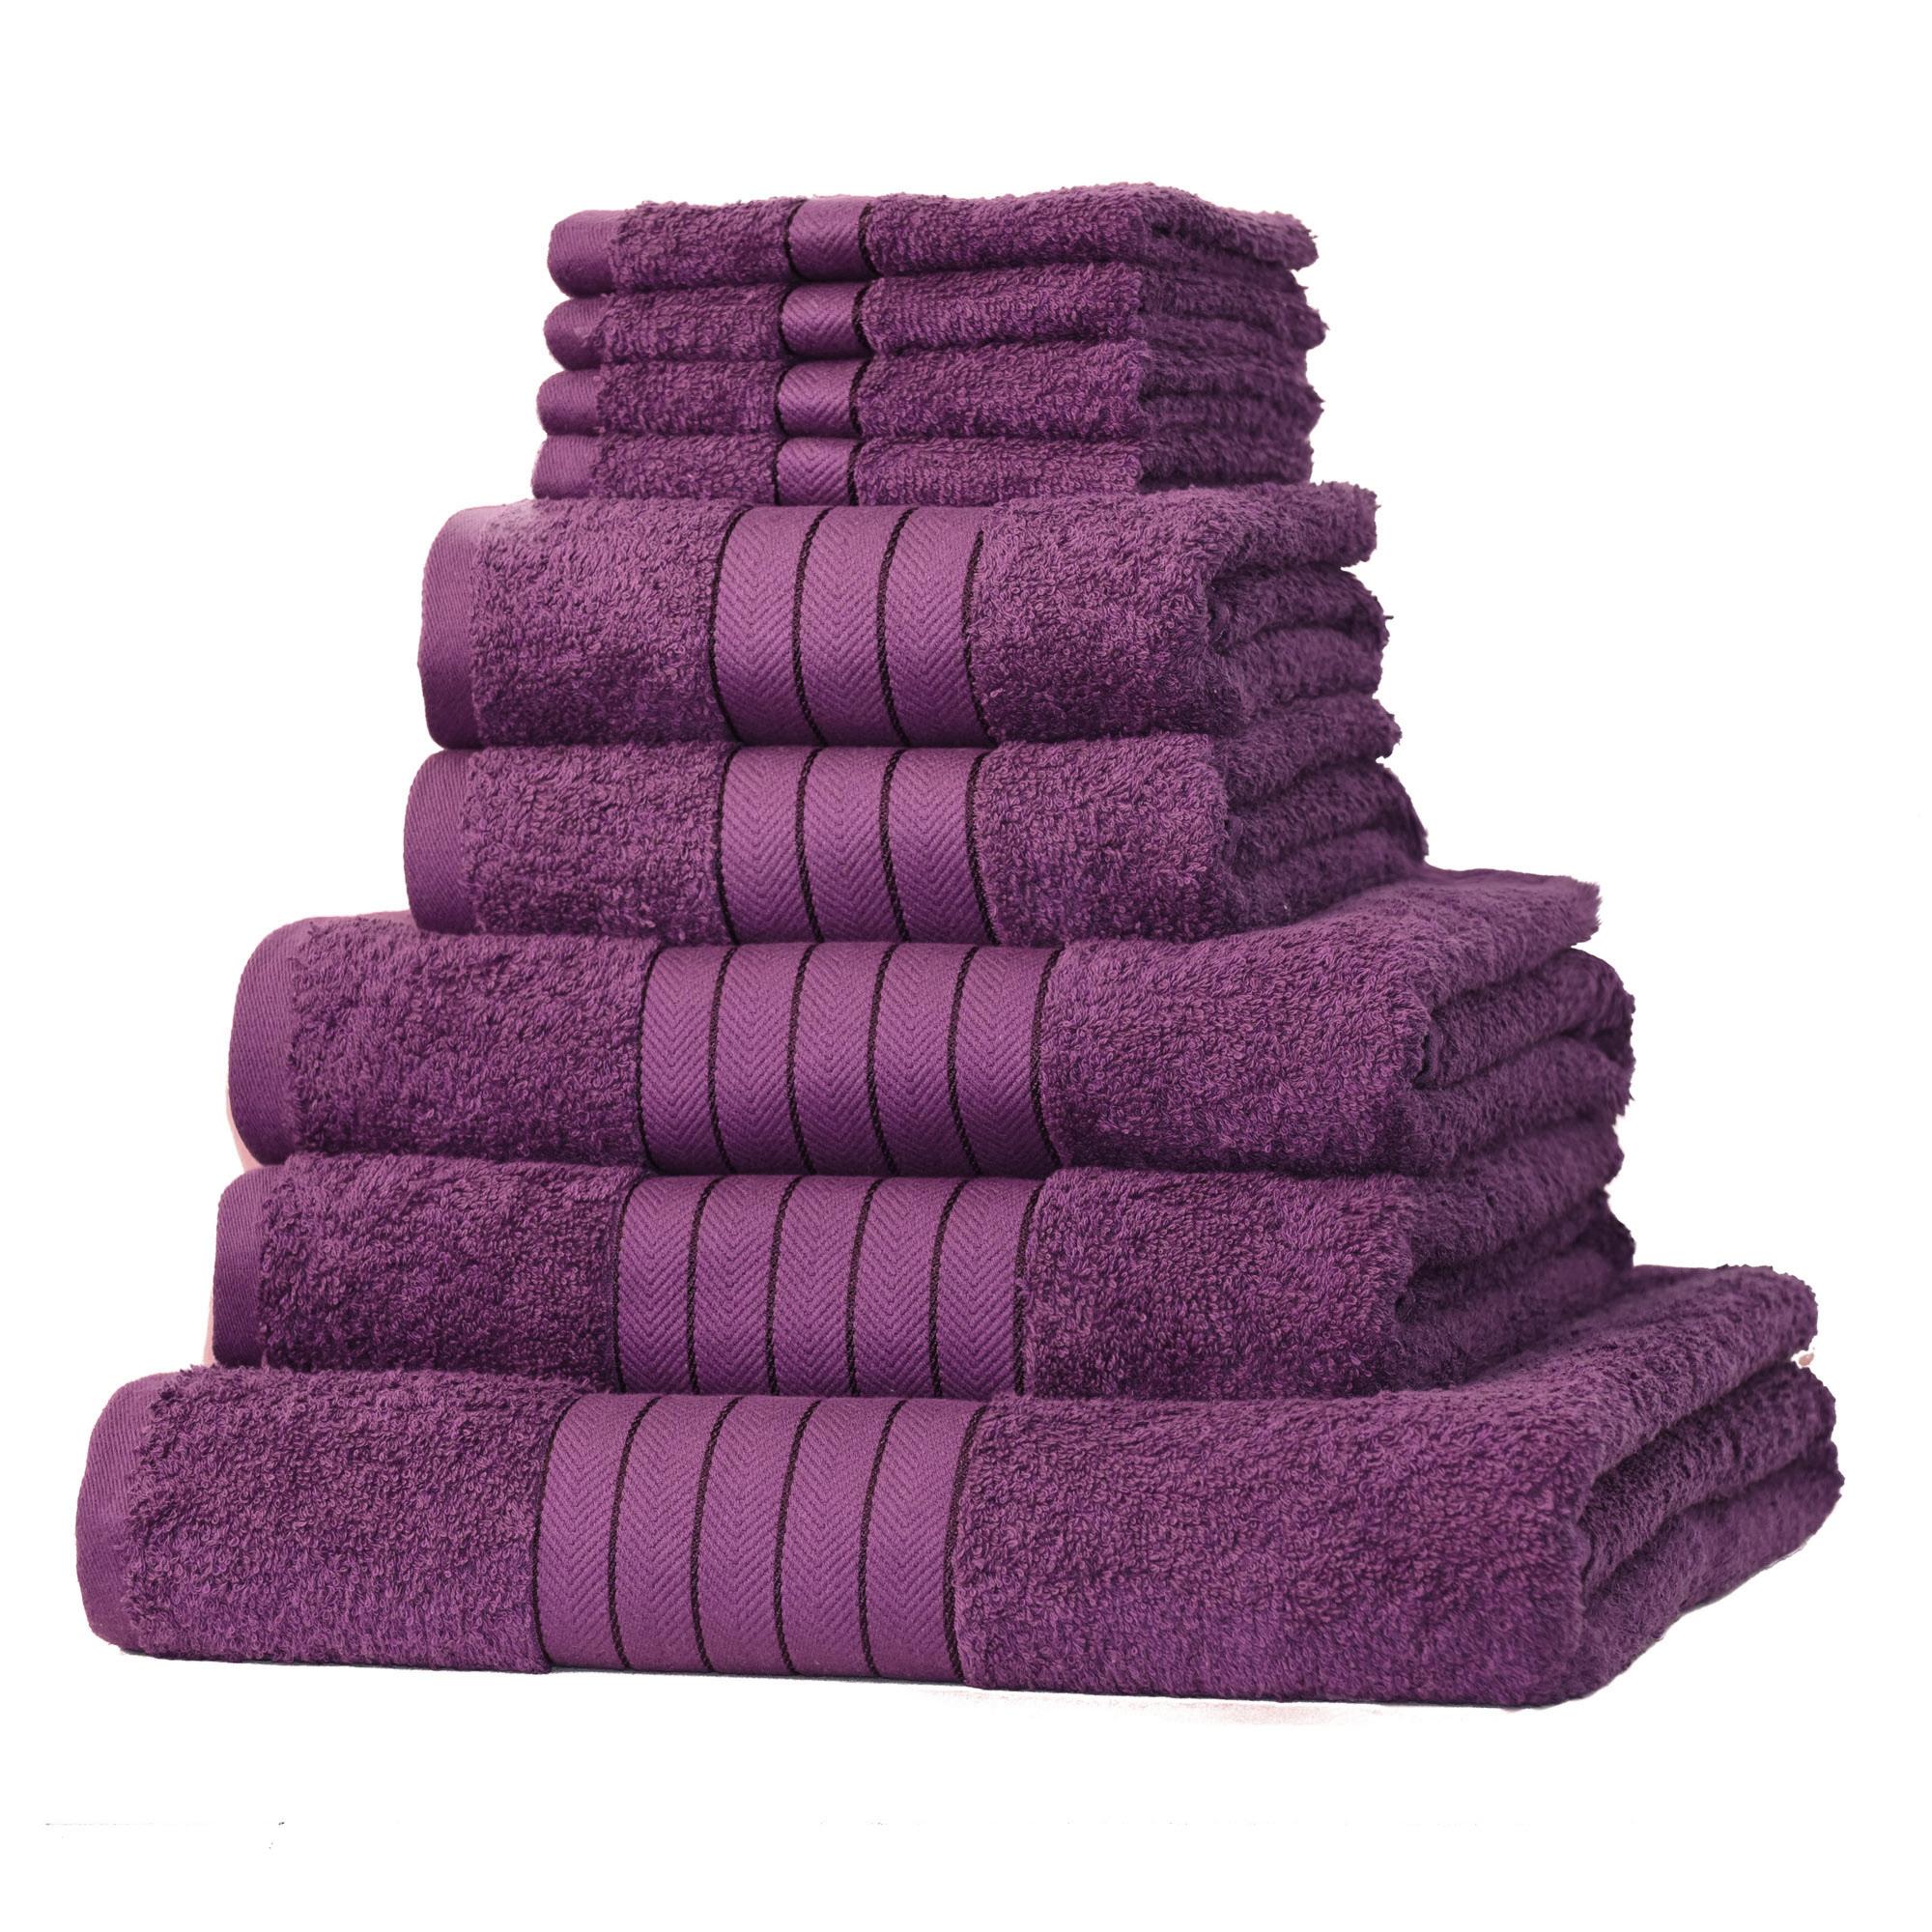 Luxury 100 egyptian cotton 9 piece bathroom towel bale for Bathroom towels